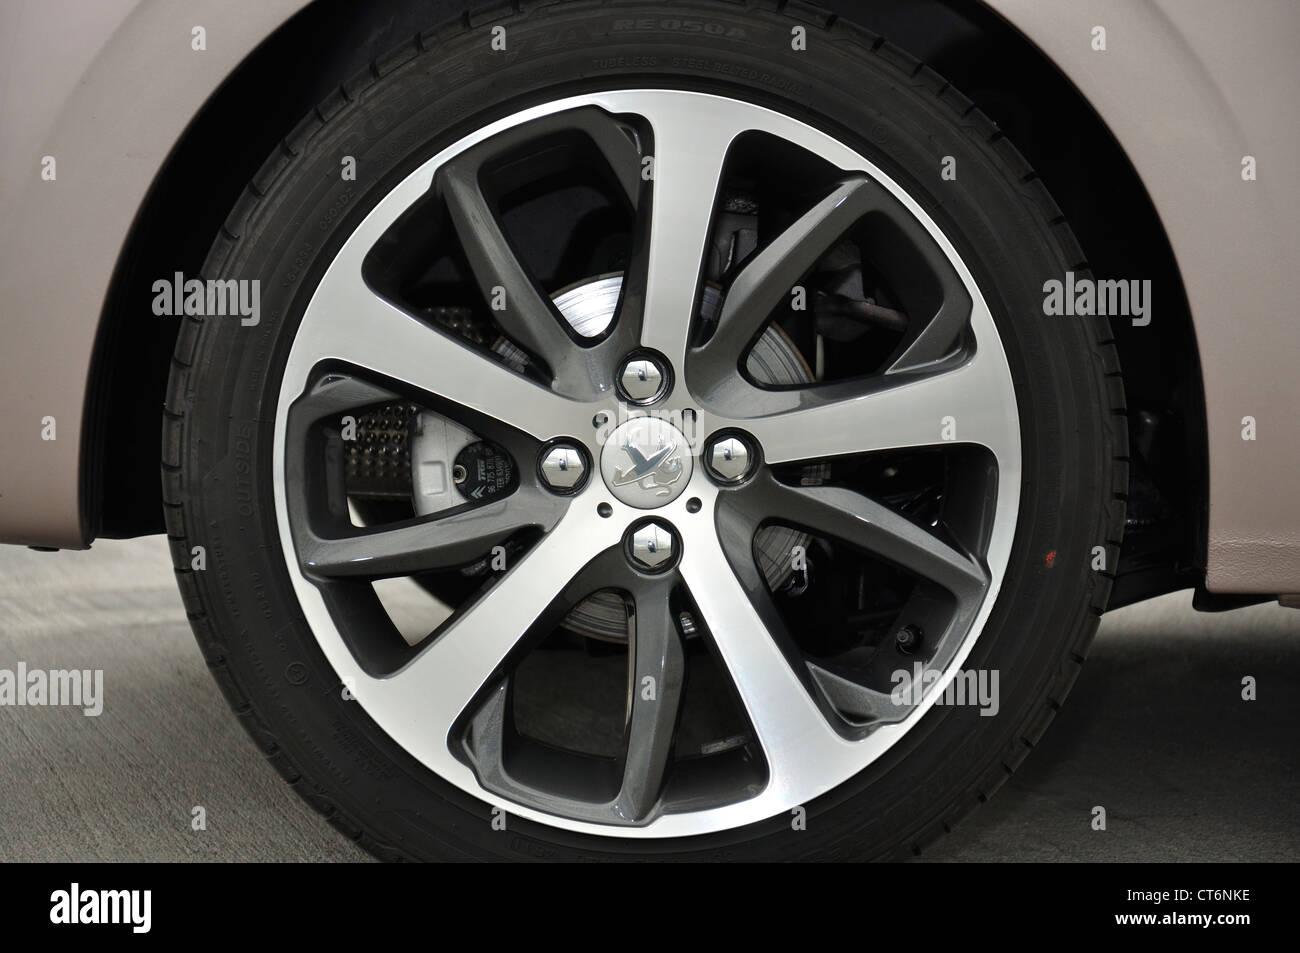 Peugeot 208, car wheel Stock Photo